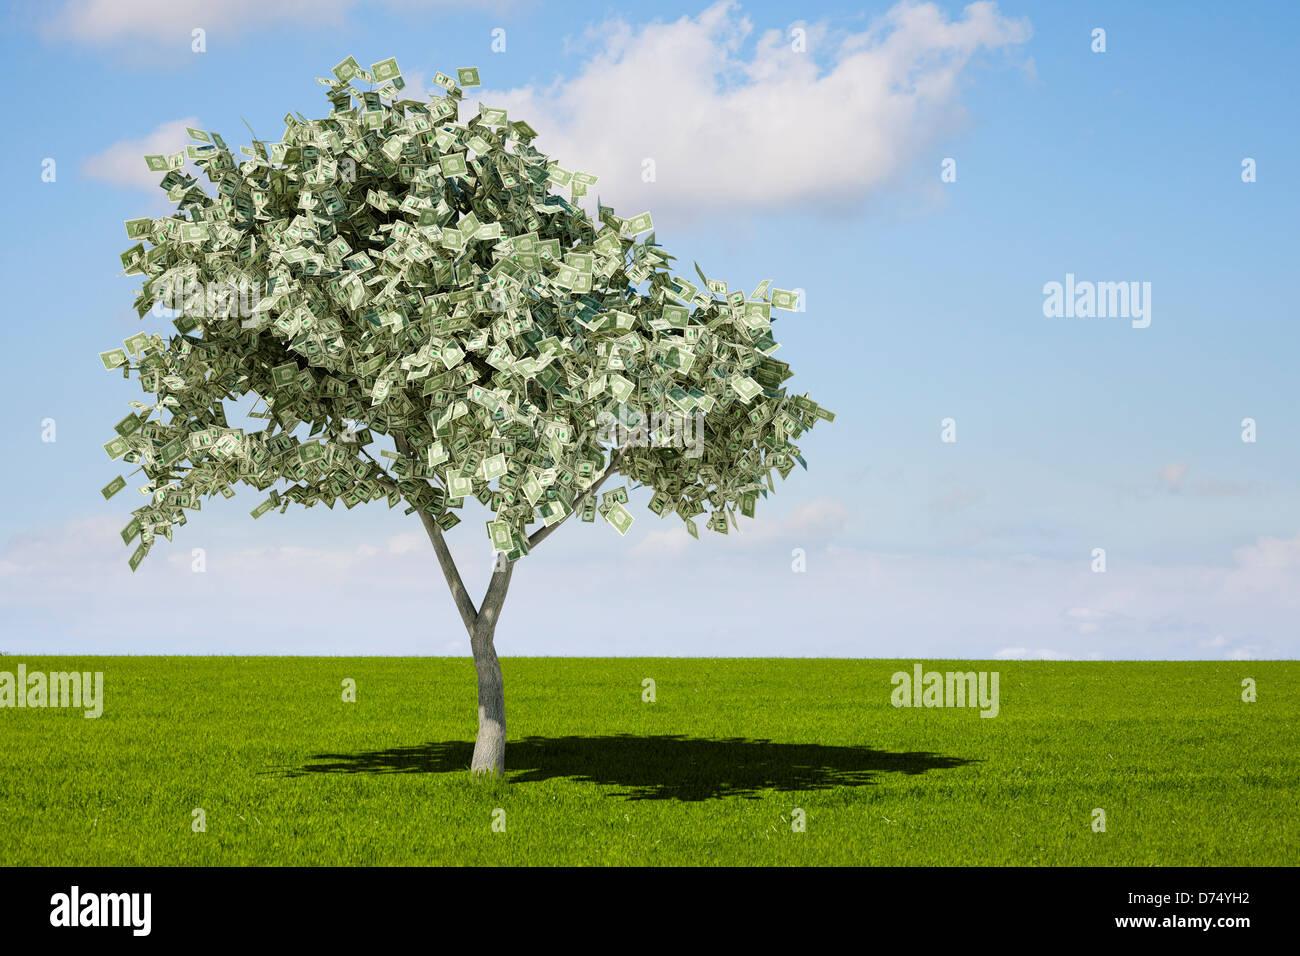 Dollar bills on a money tree - concept - Stock Image